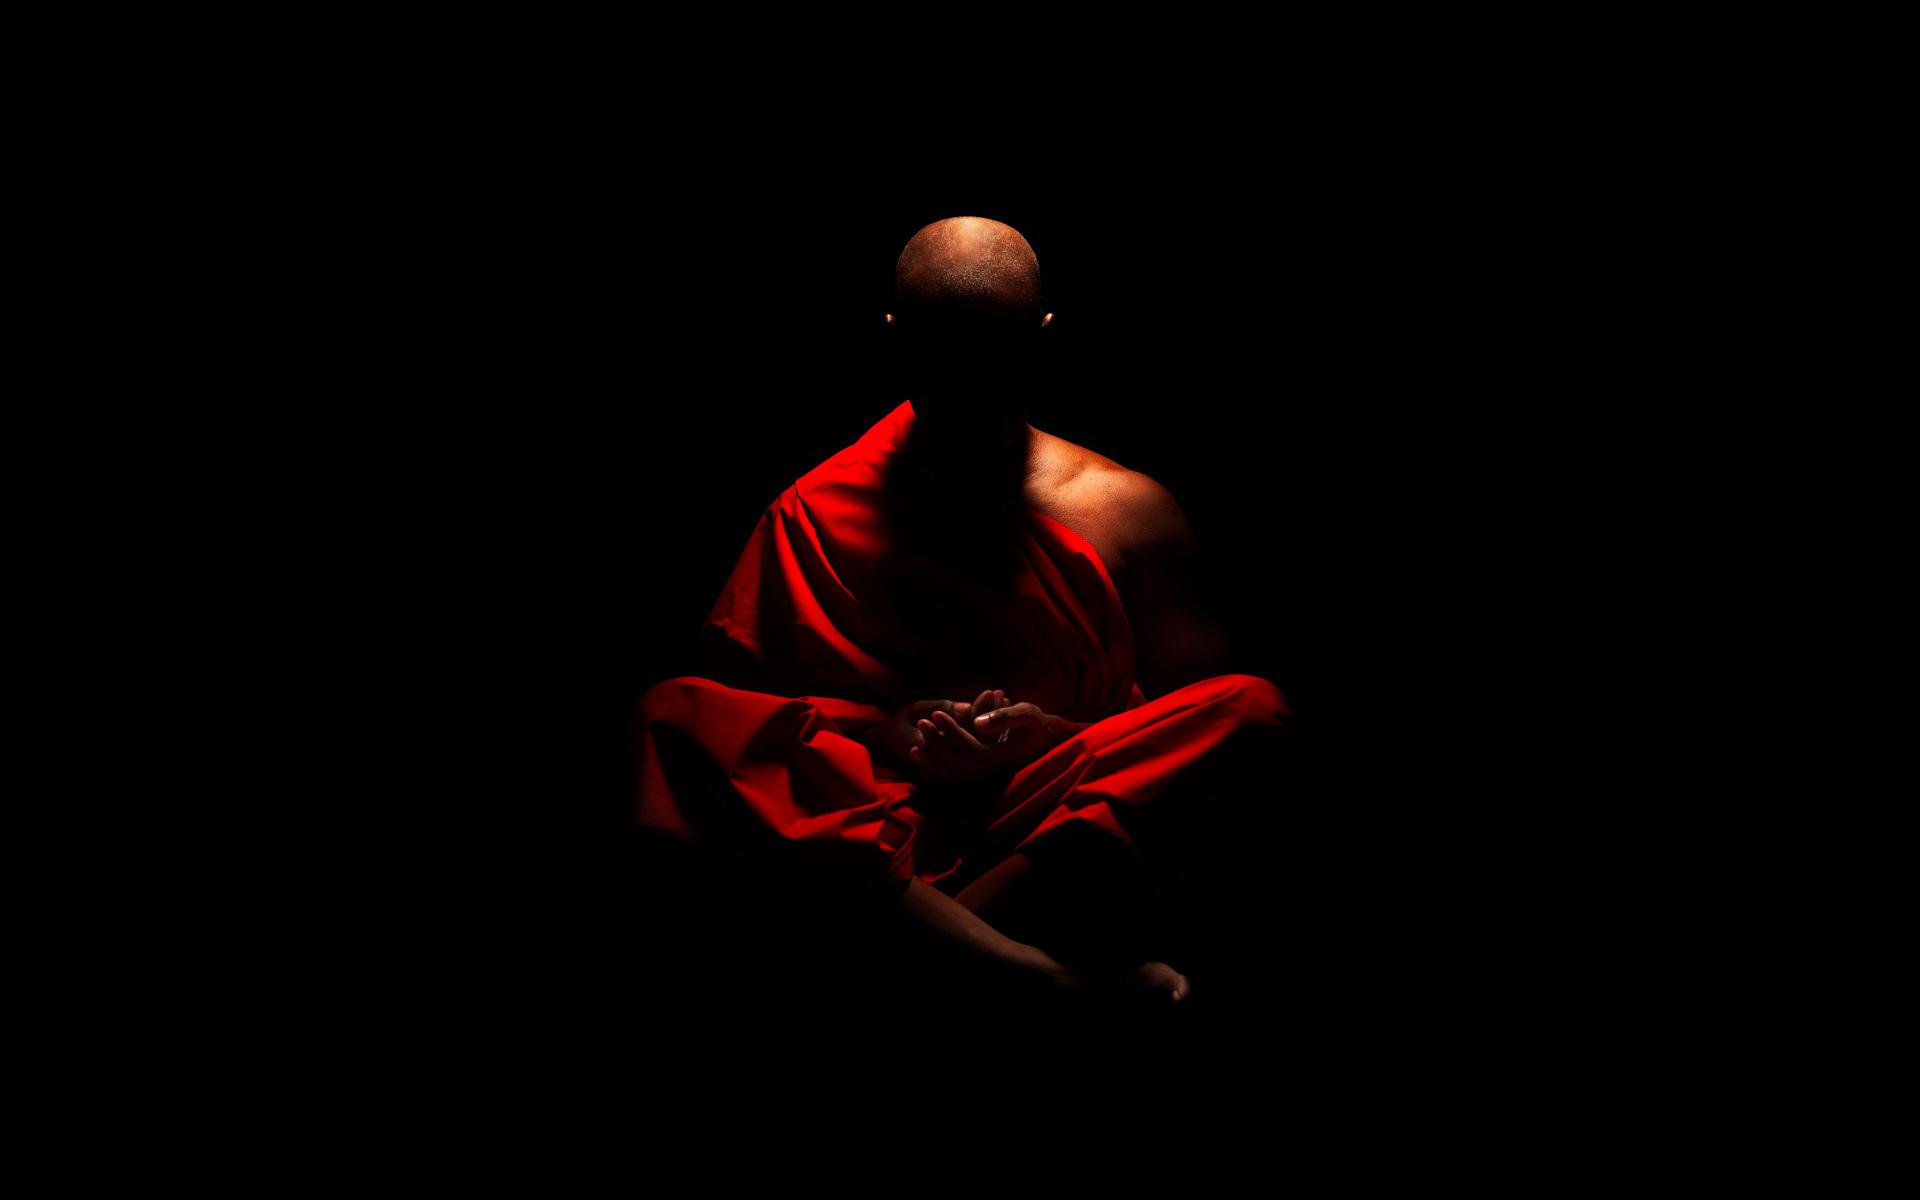 monk religion robe zen wallpaper 1920x1200 27848 WallpaperUP 1920x1200